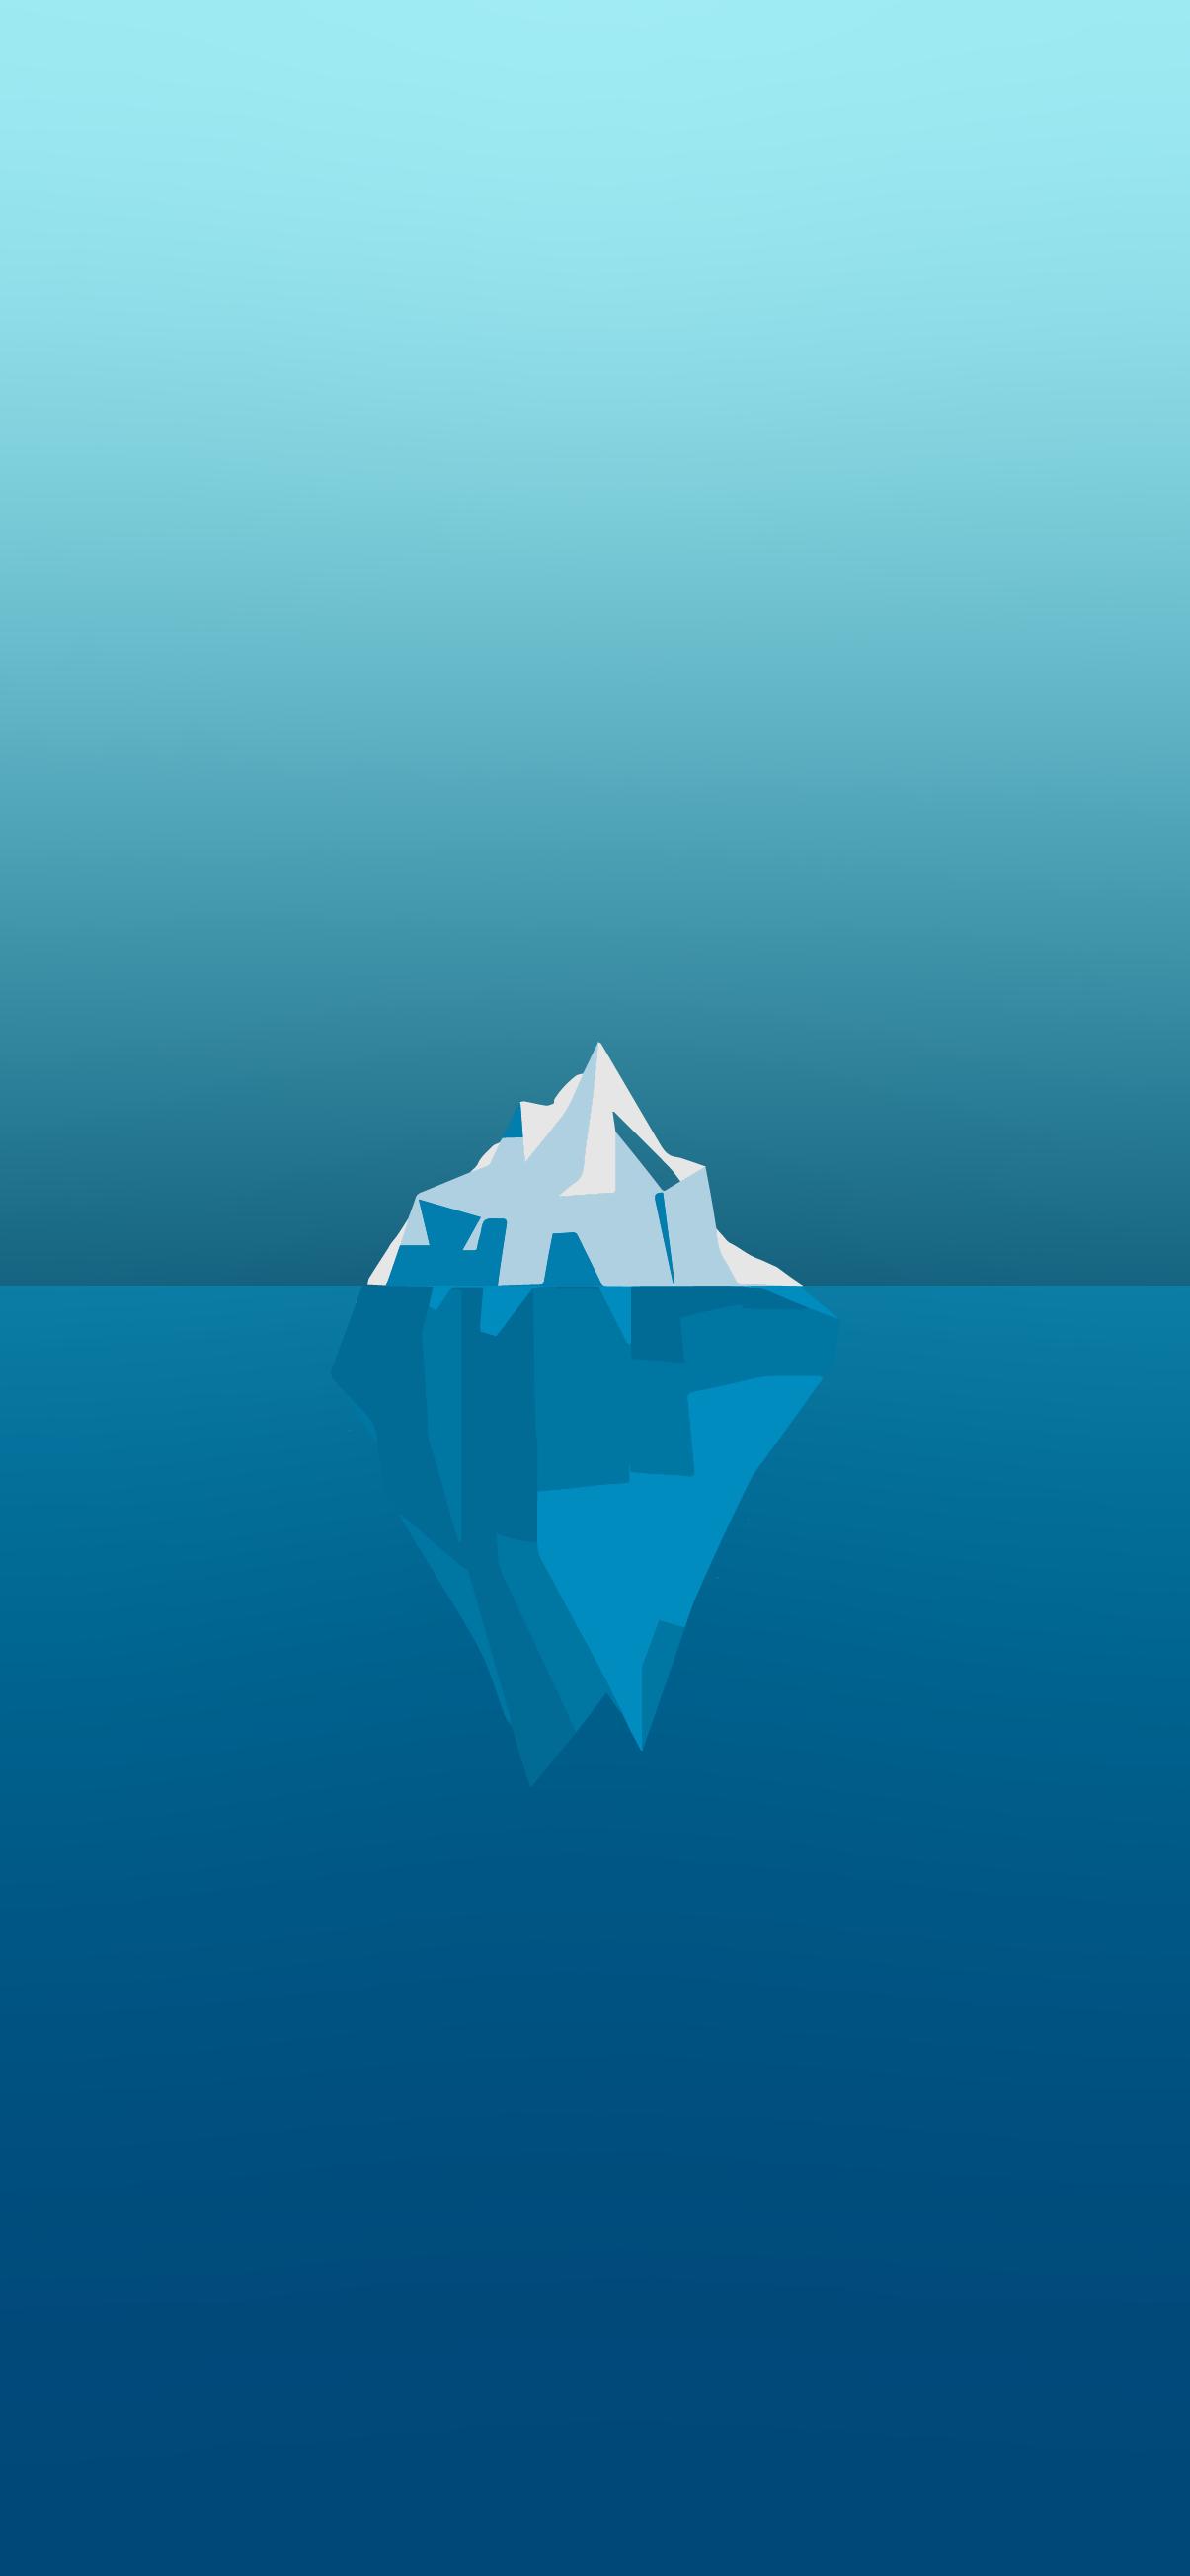 Minimalist phone wallpaper - Iceberg | HeroScreen - Cool ...